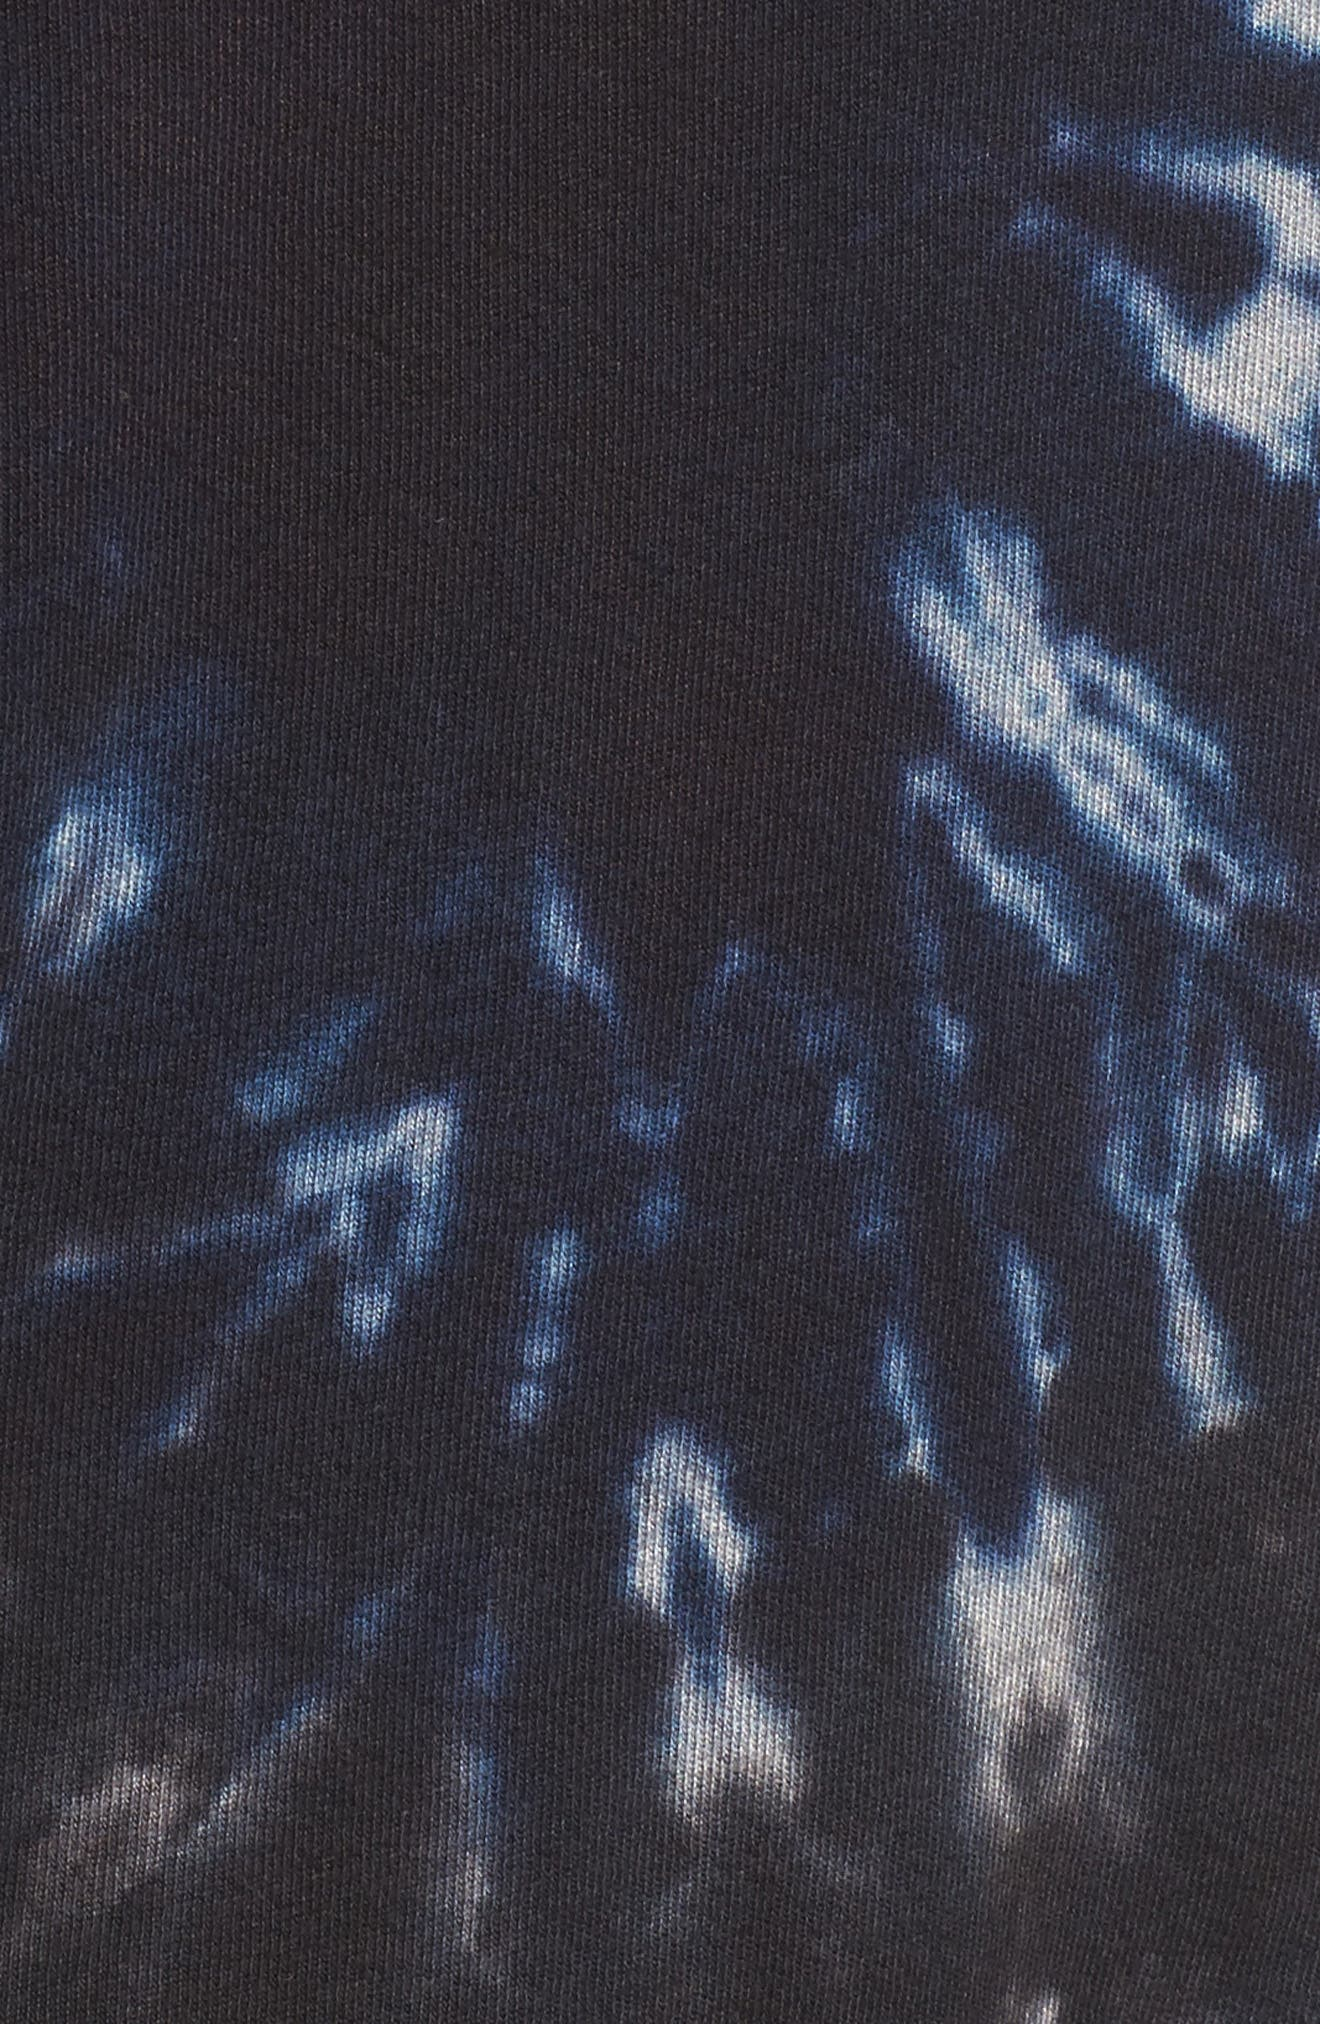 Nic Distressed Sweatshirt,                             Alternate thumbnail 5, color,                             010